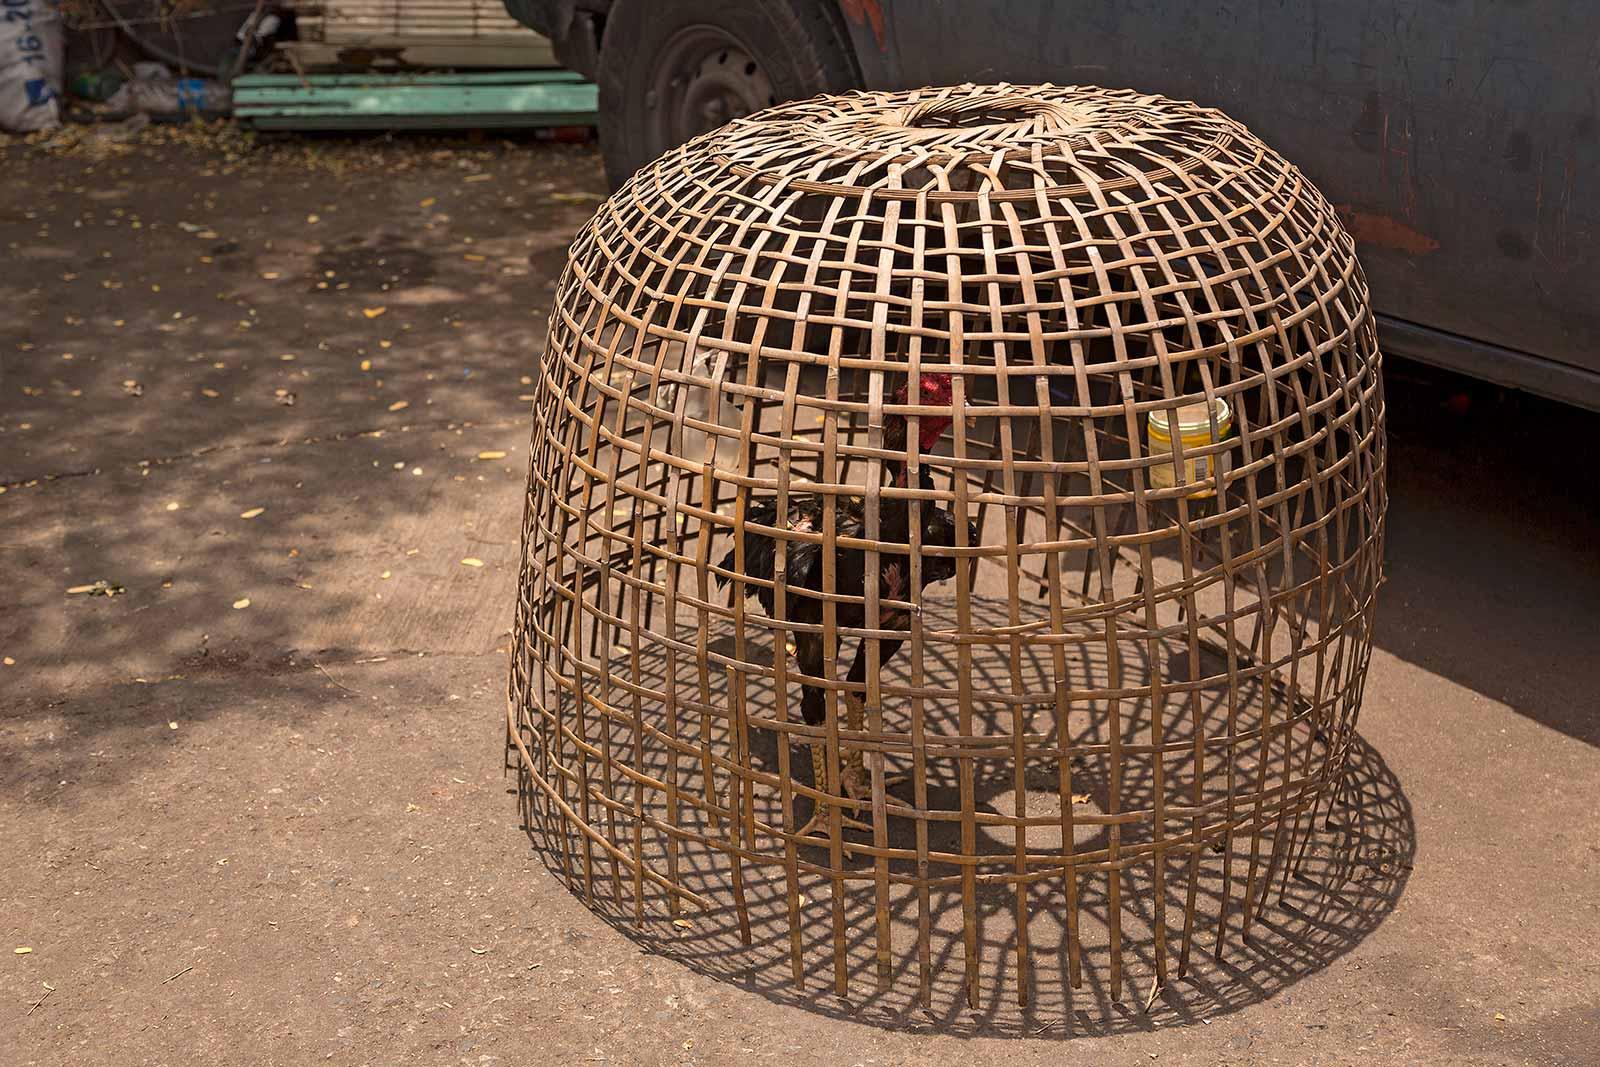 chatuchak-market-pet-section-cock-fighting